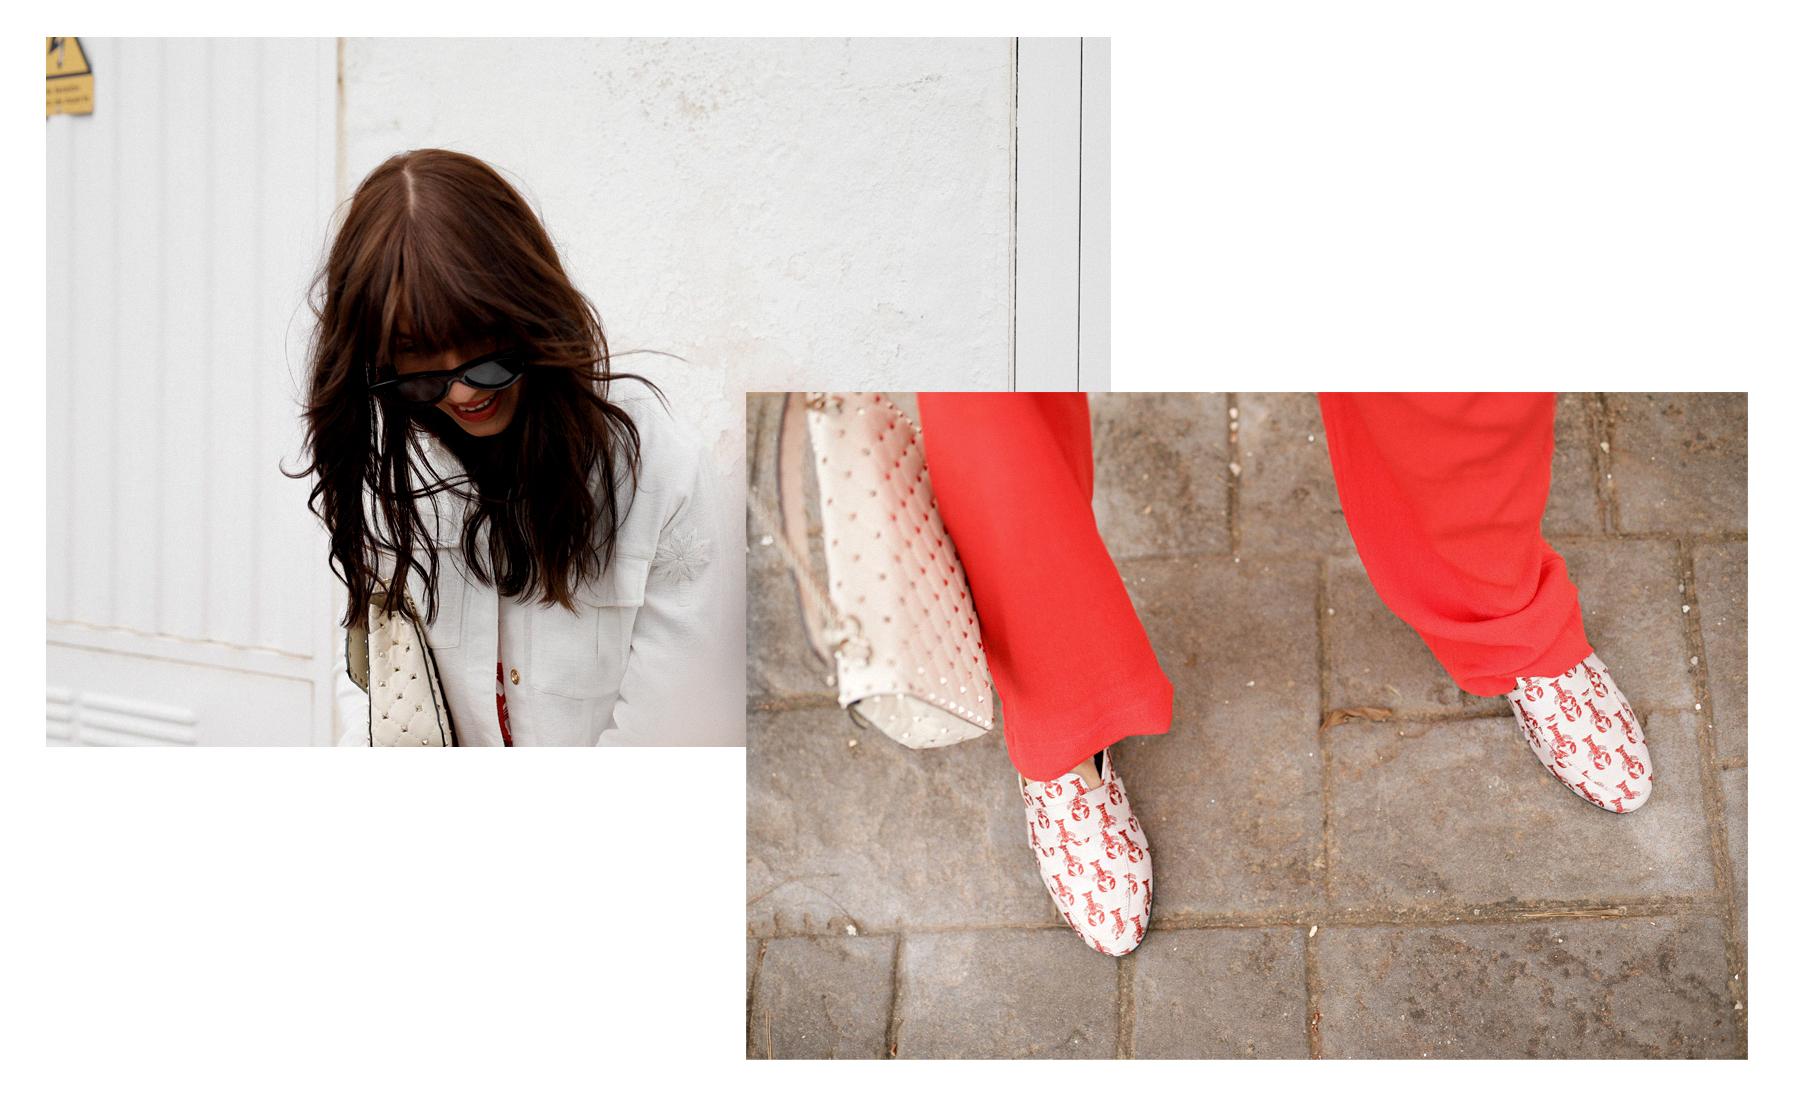 fabienne chapot lobster shirt slippers red white style mallorca cala d'or spain summer fashion spring 2018 modeblog modeblogger catsanddogsblog ricarda schernus styleblogger german fashionbloggers max bechmann fotografie düsseldorf 3